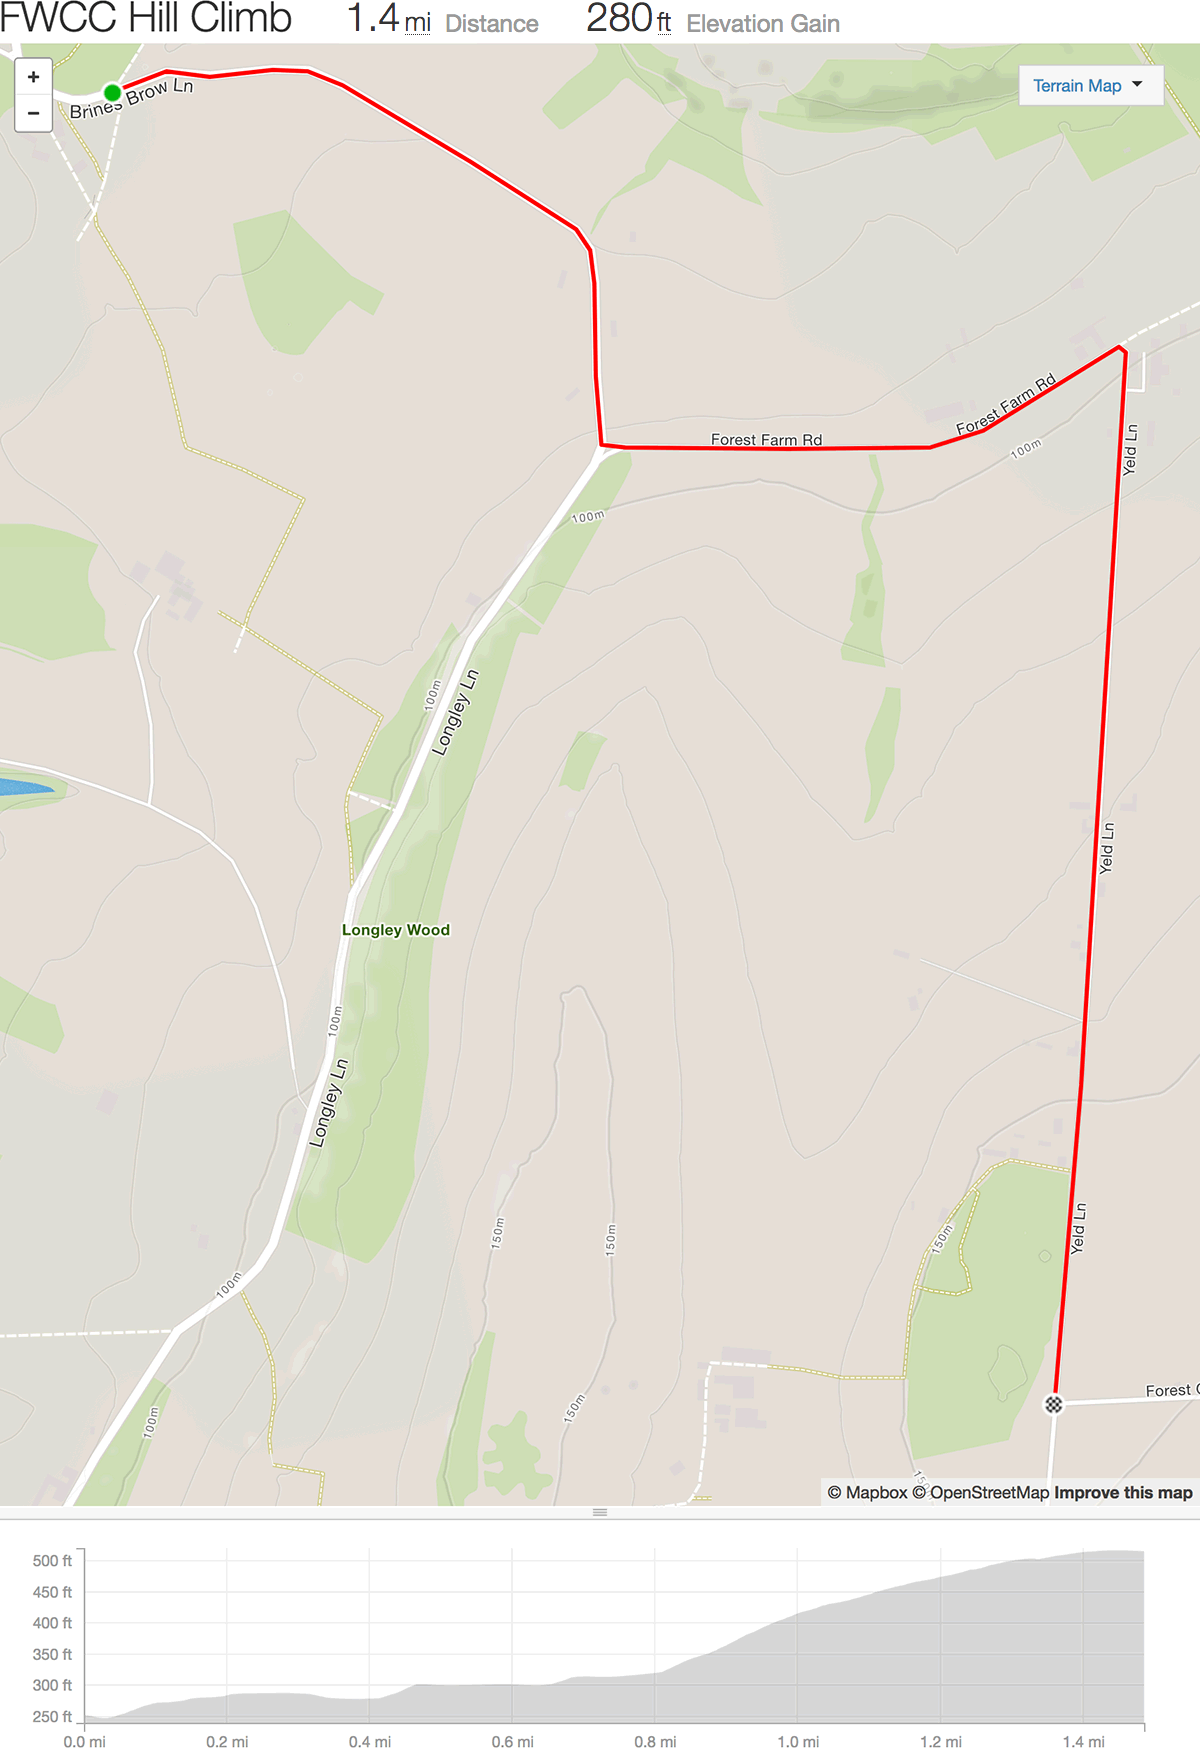 frodsham wheelers hillclimb route 280ft 1.4 miles